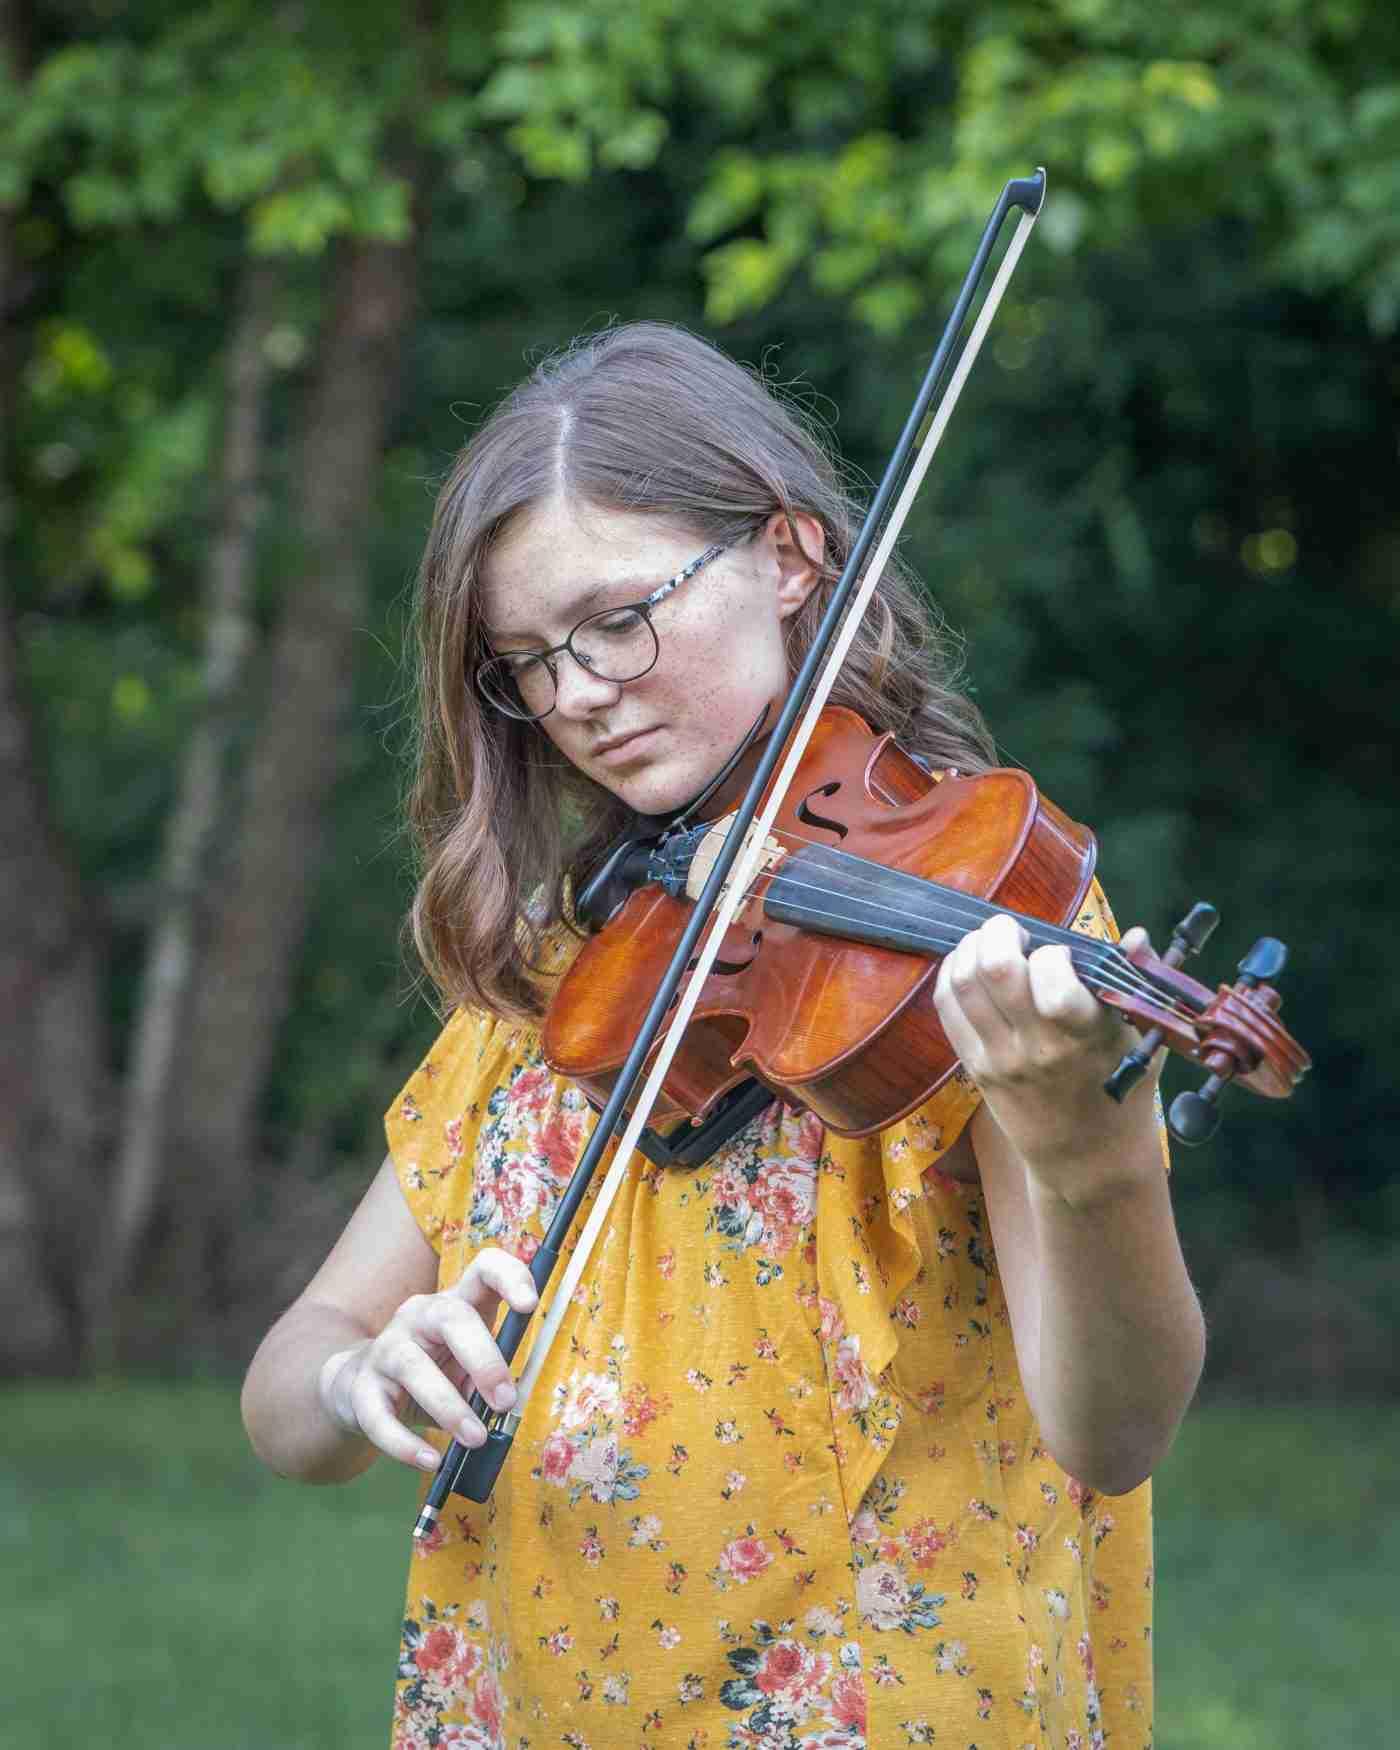 Hanna Senior Portrait Violin 2